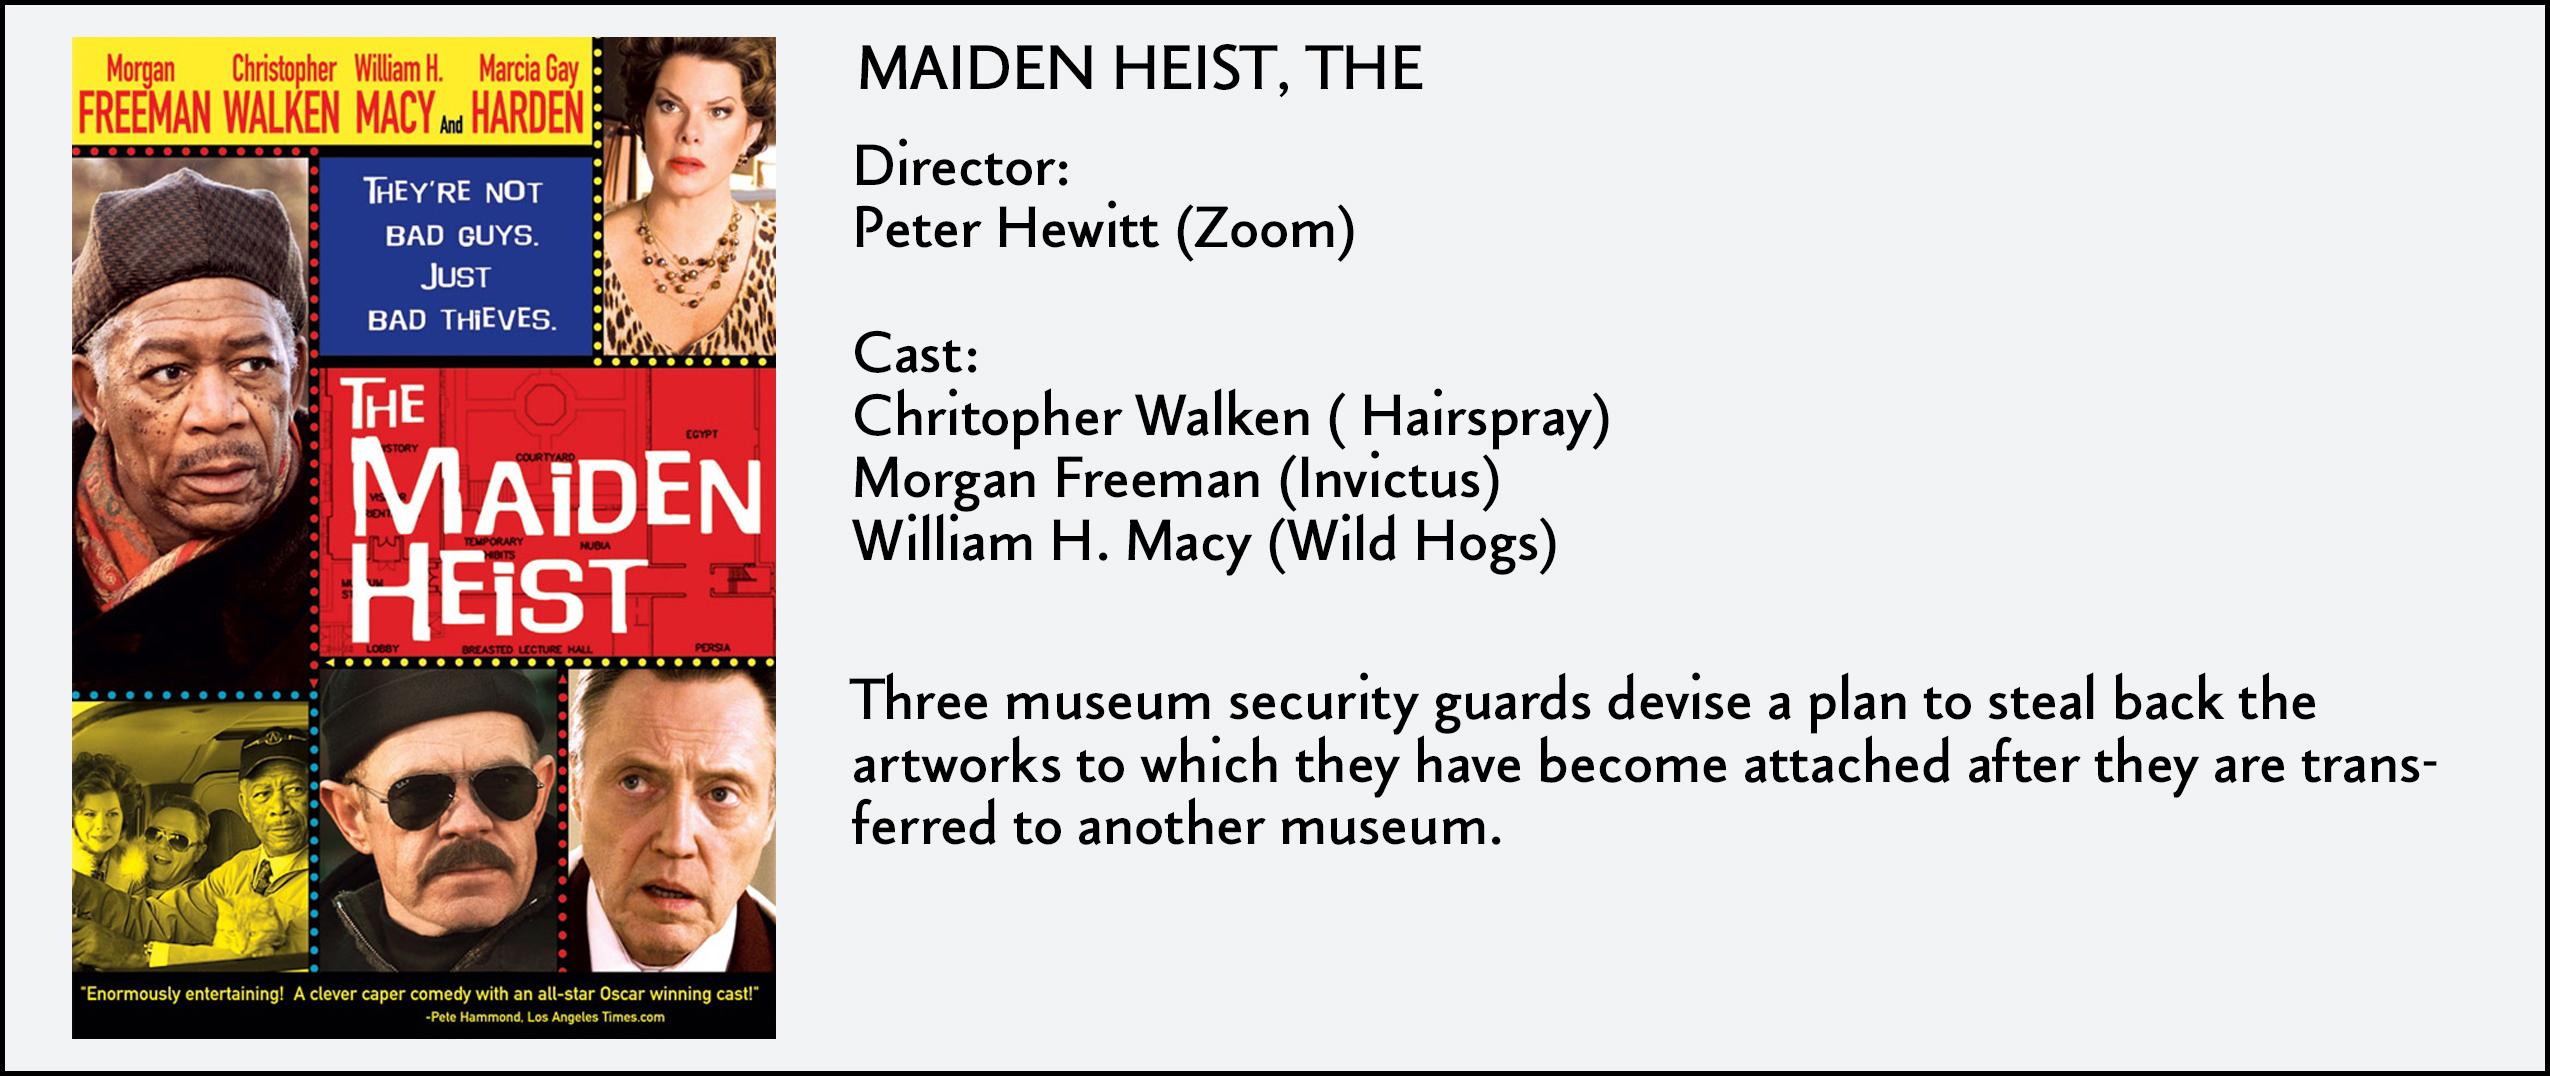 Maiden Heist